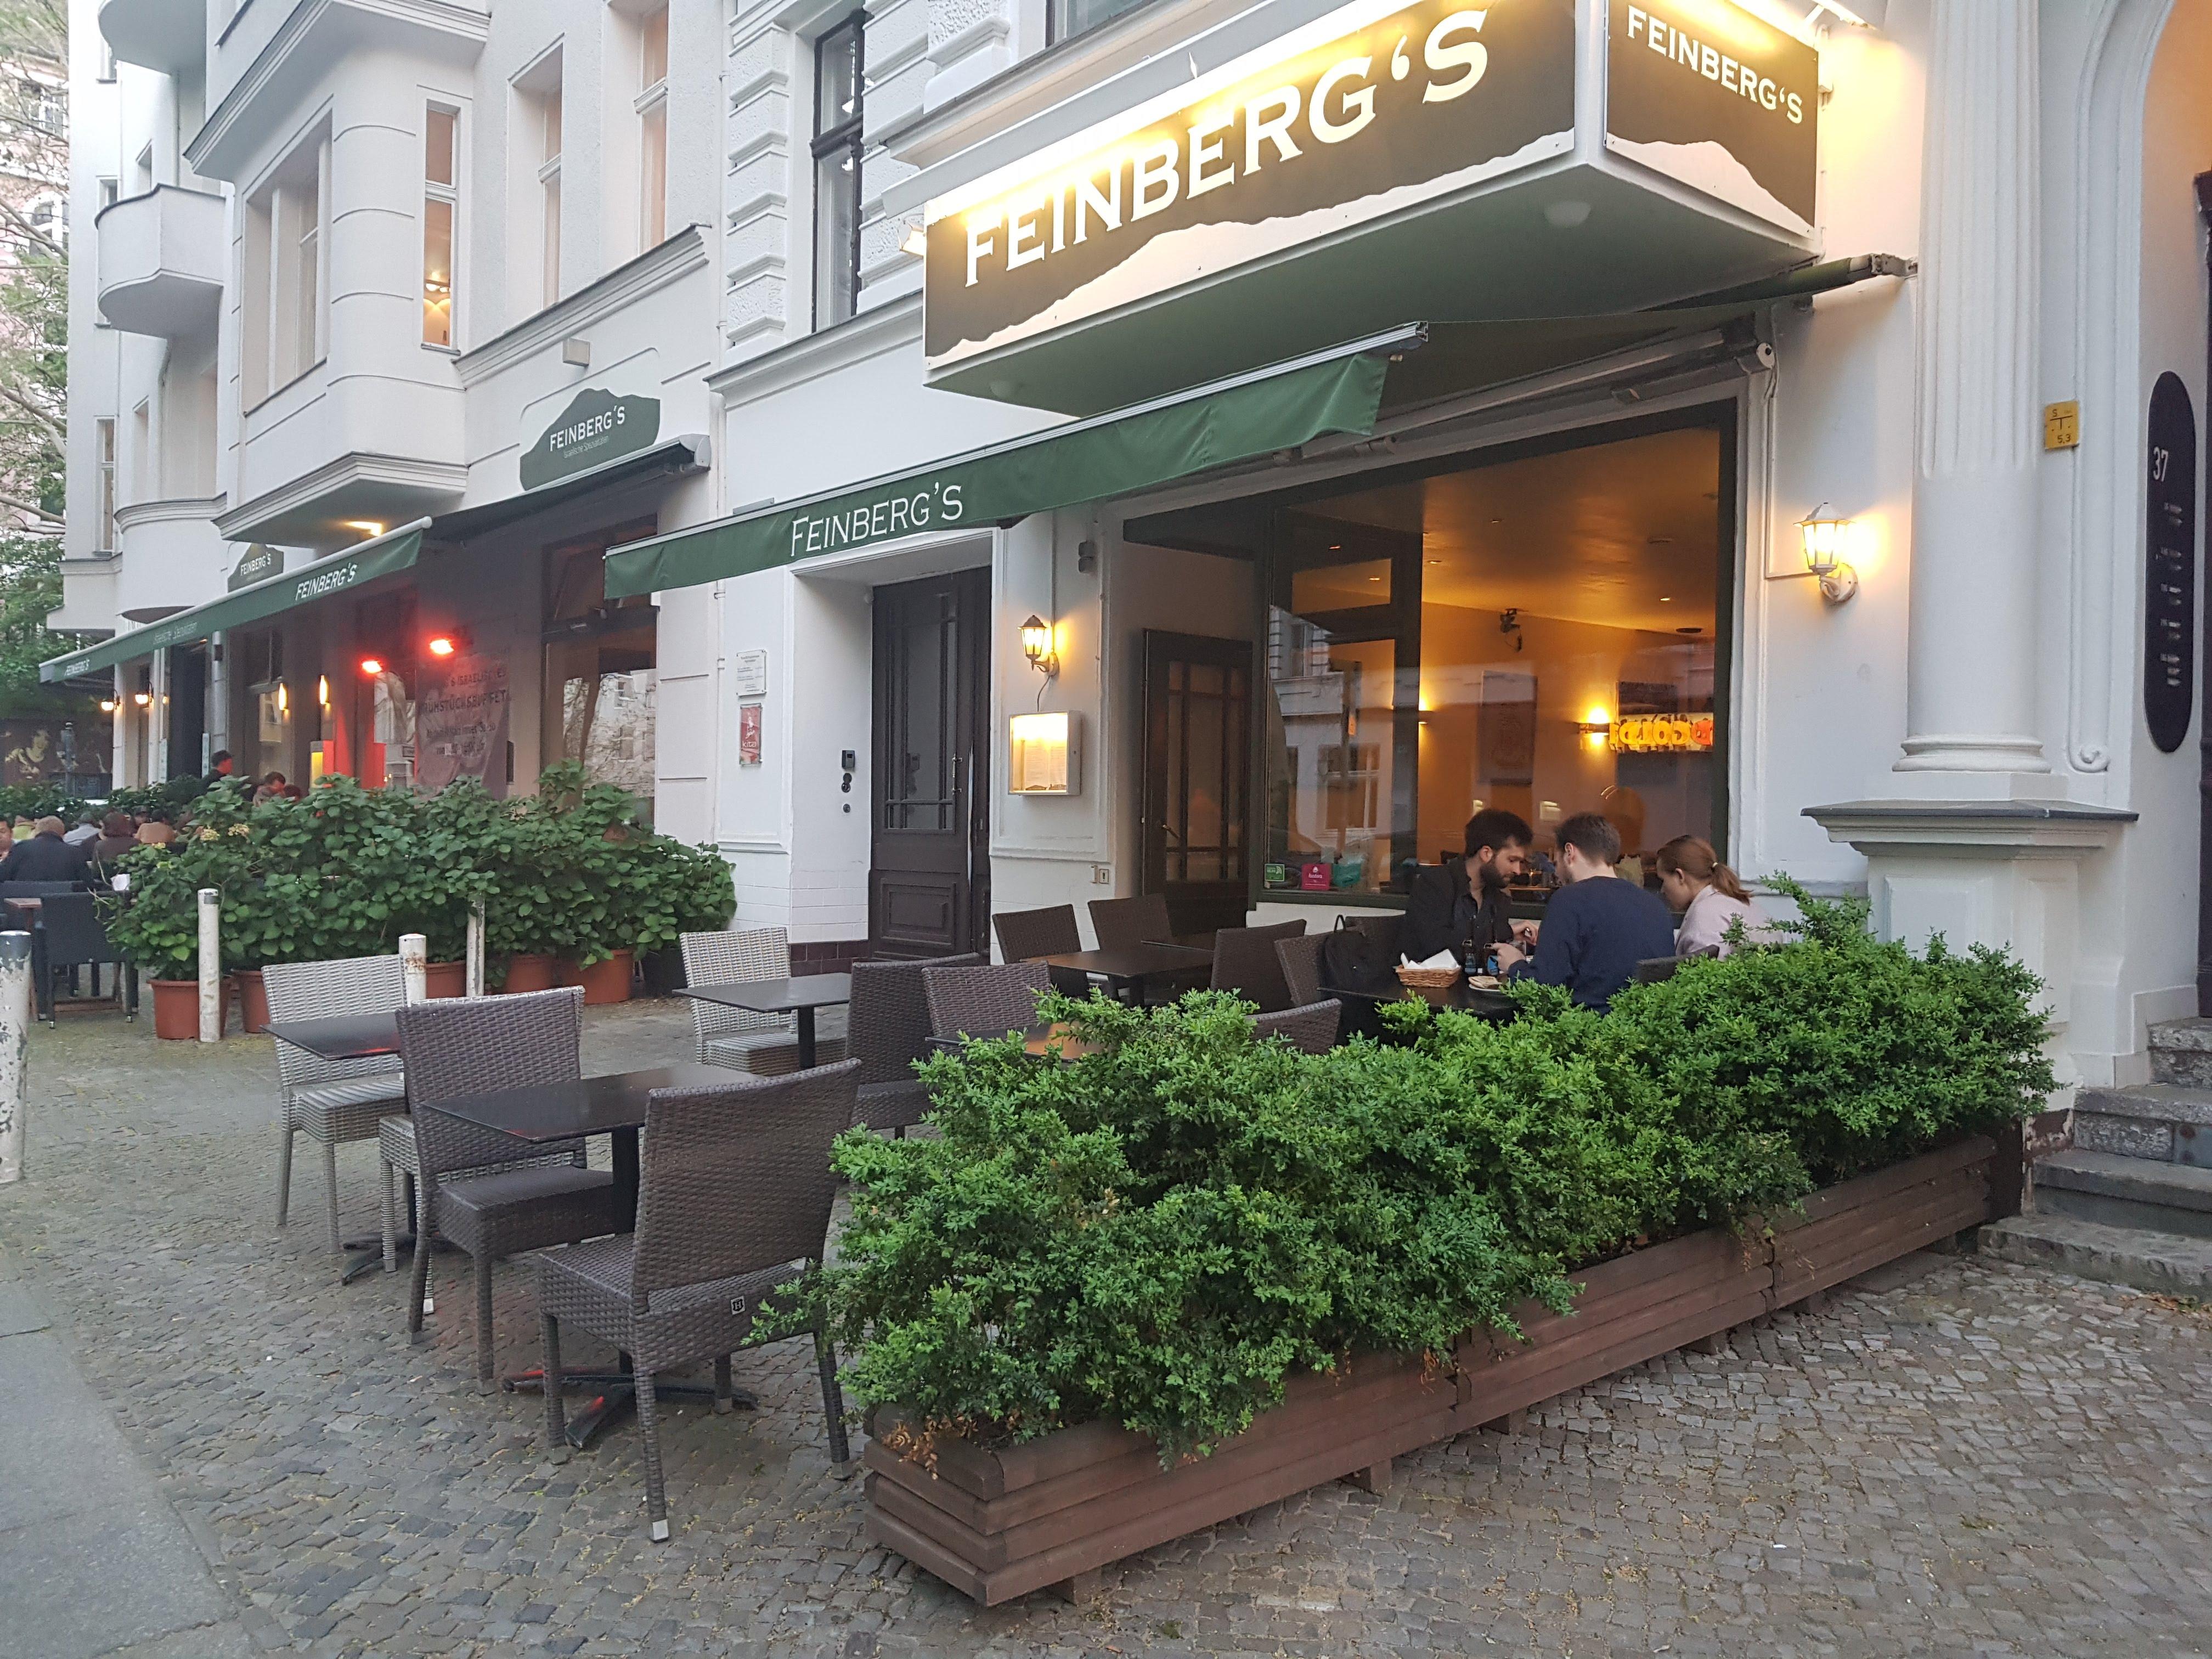 Feinbergs, Berlin